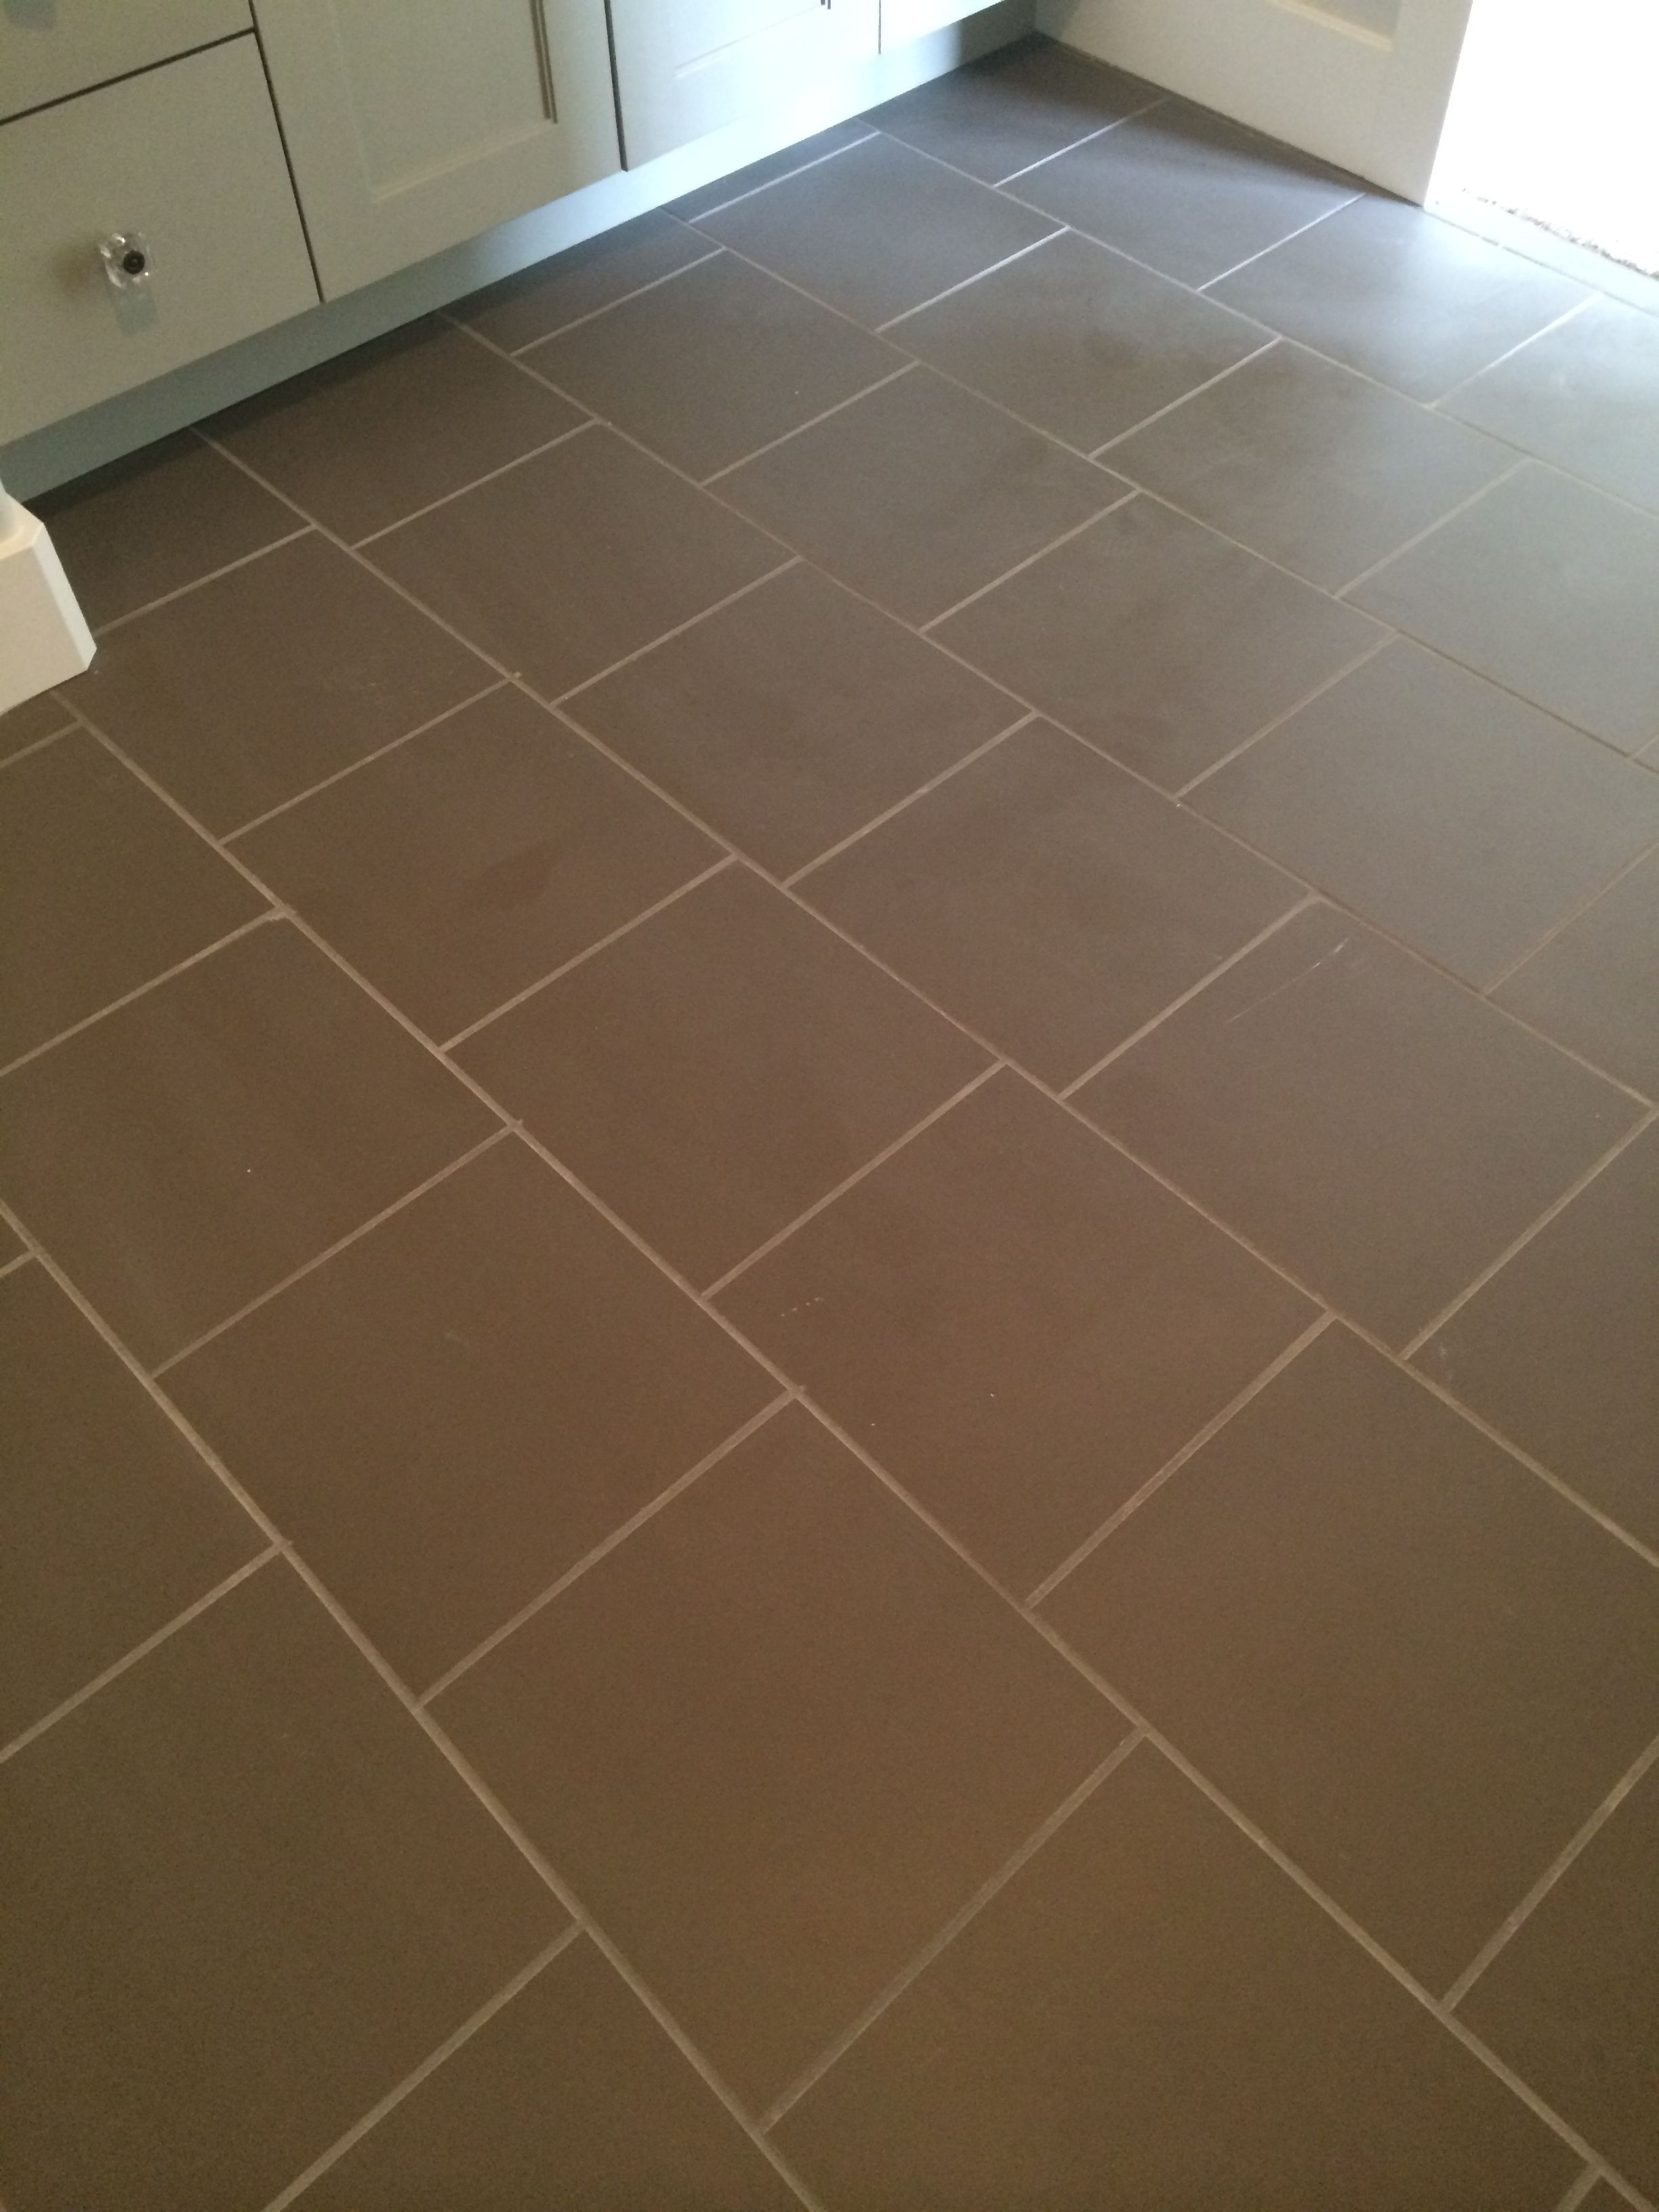 13x13 matte black tile in brick pattern with light gray for 13x13 floor tiles